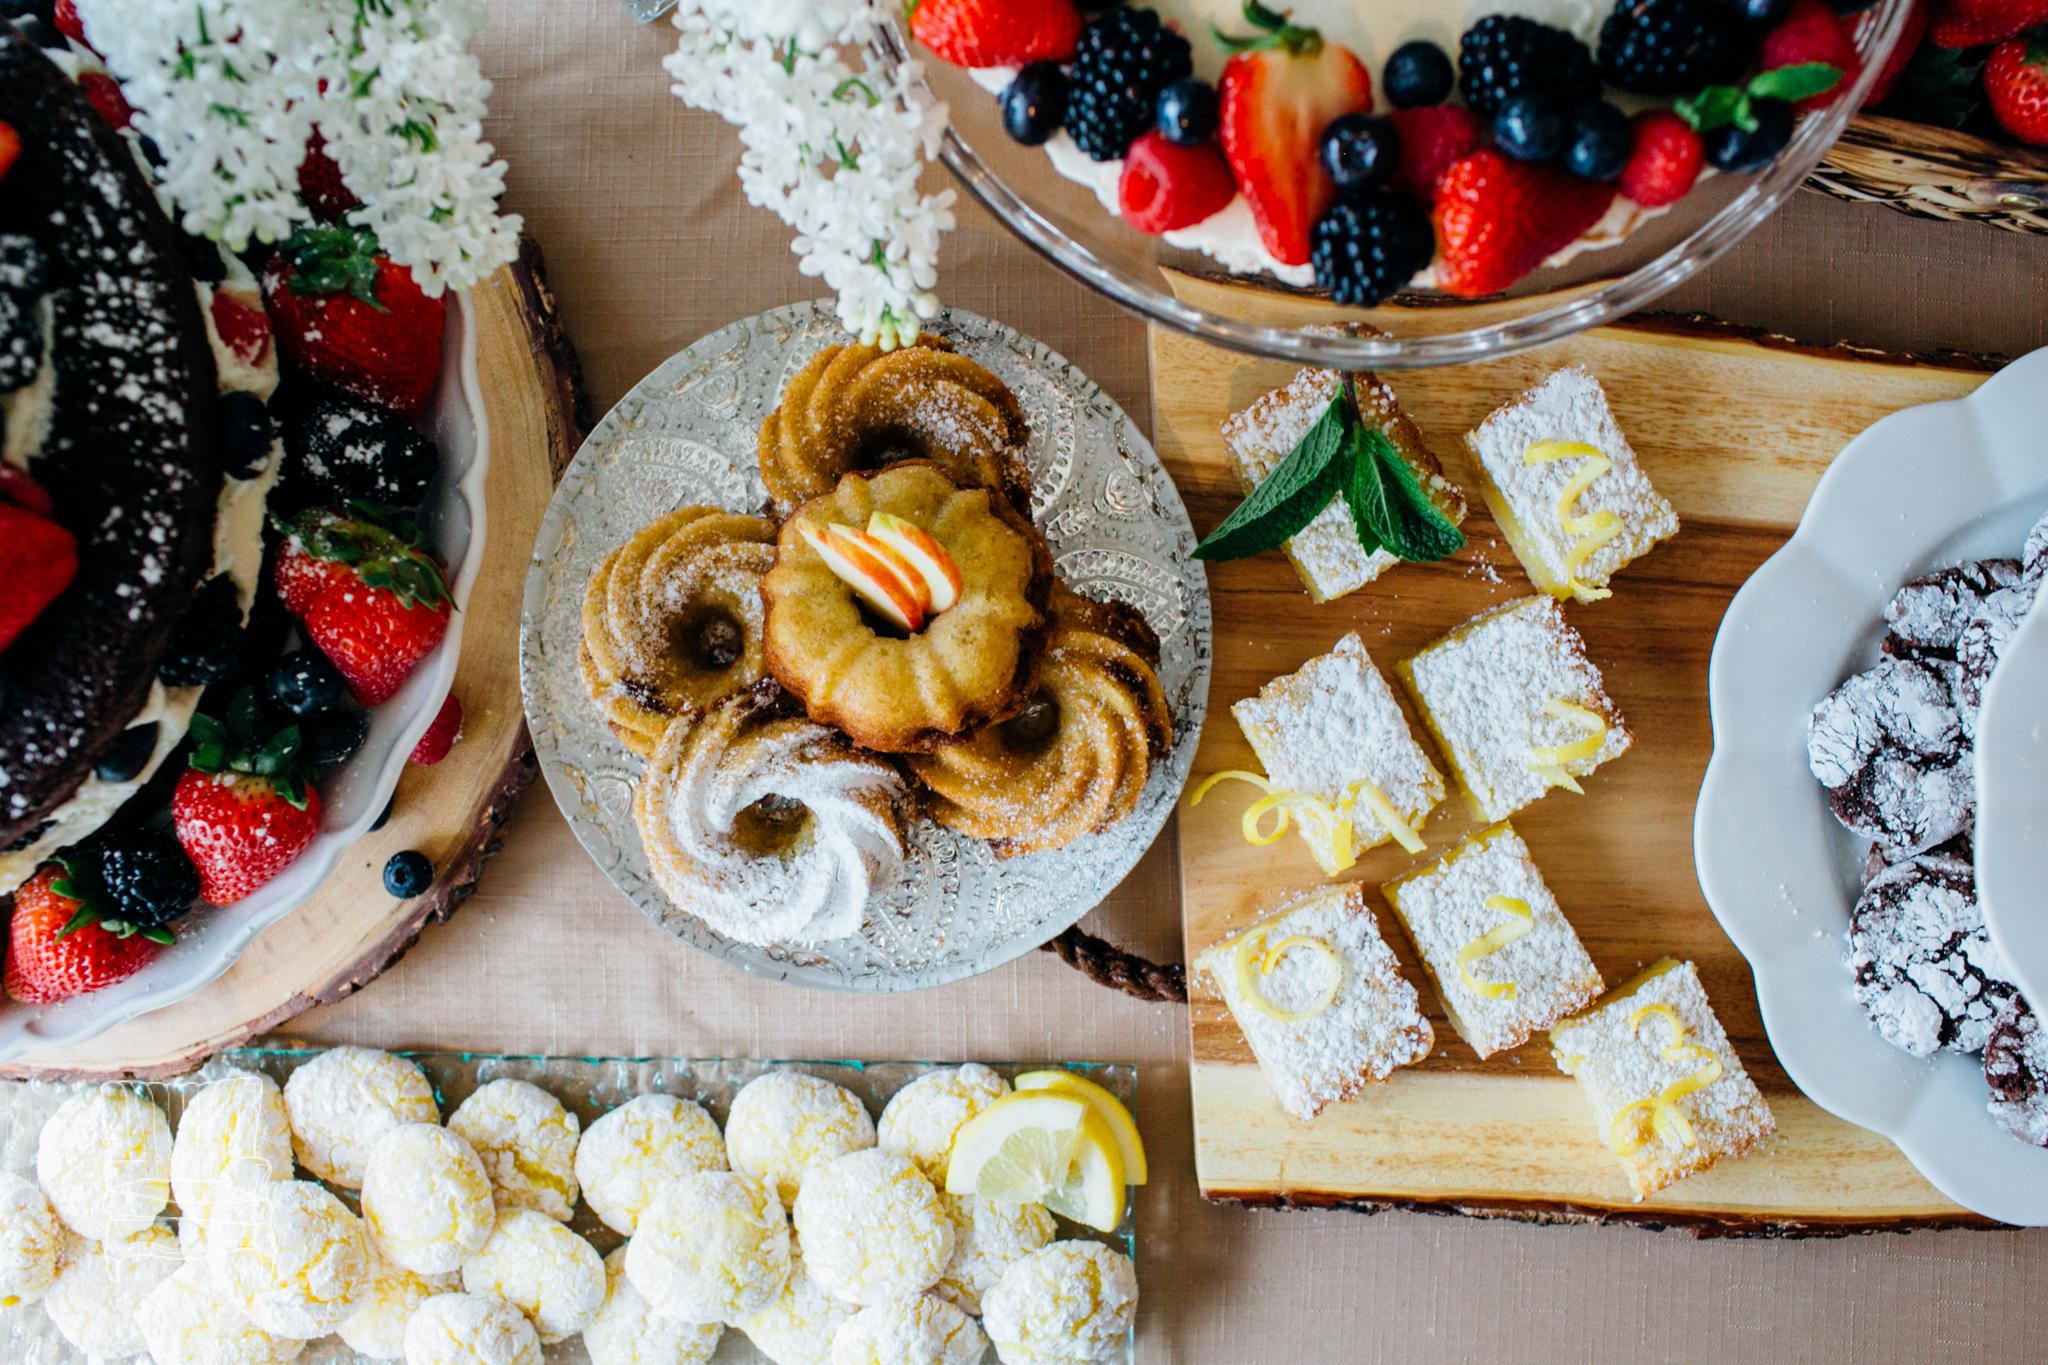 bellingham-food-dessert-marketing-photographer-photo -5.jpg